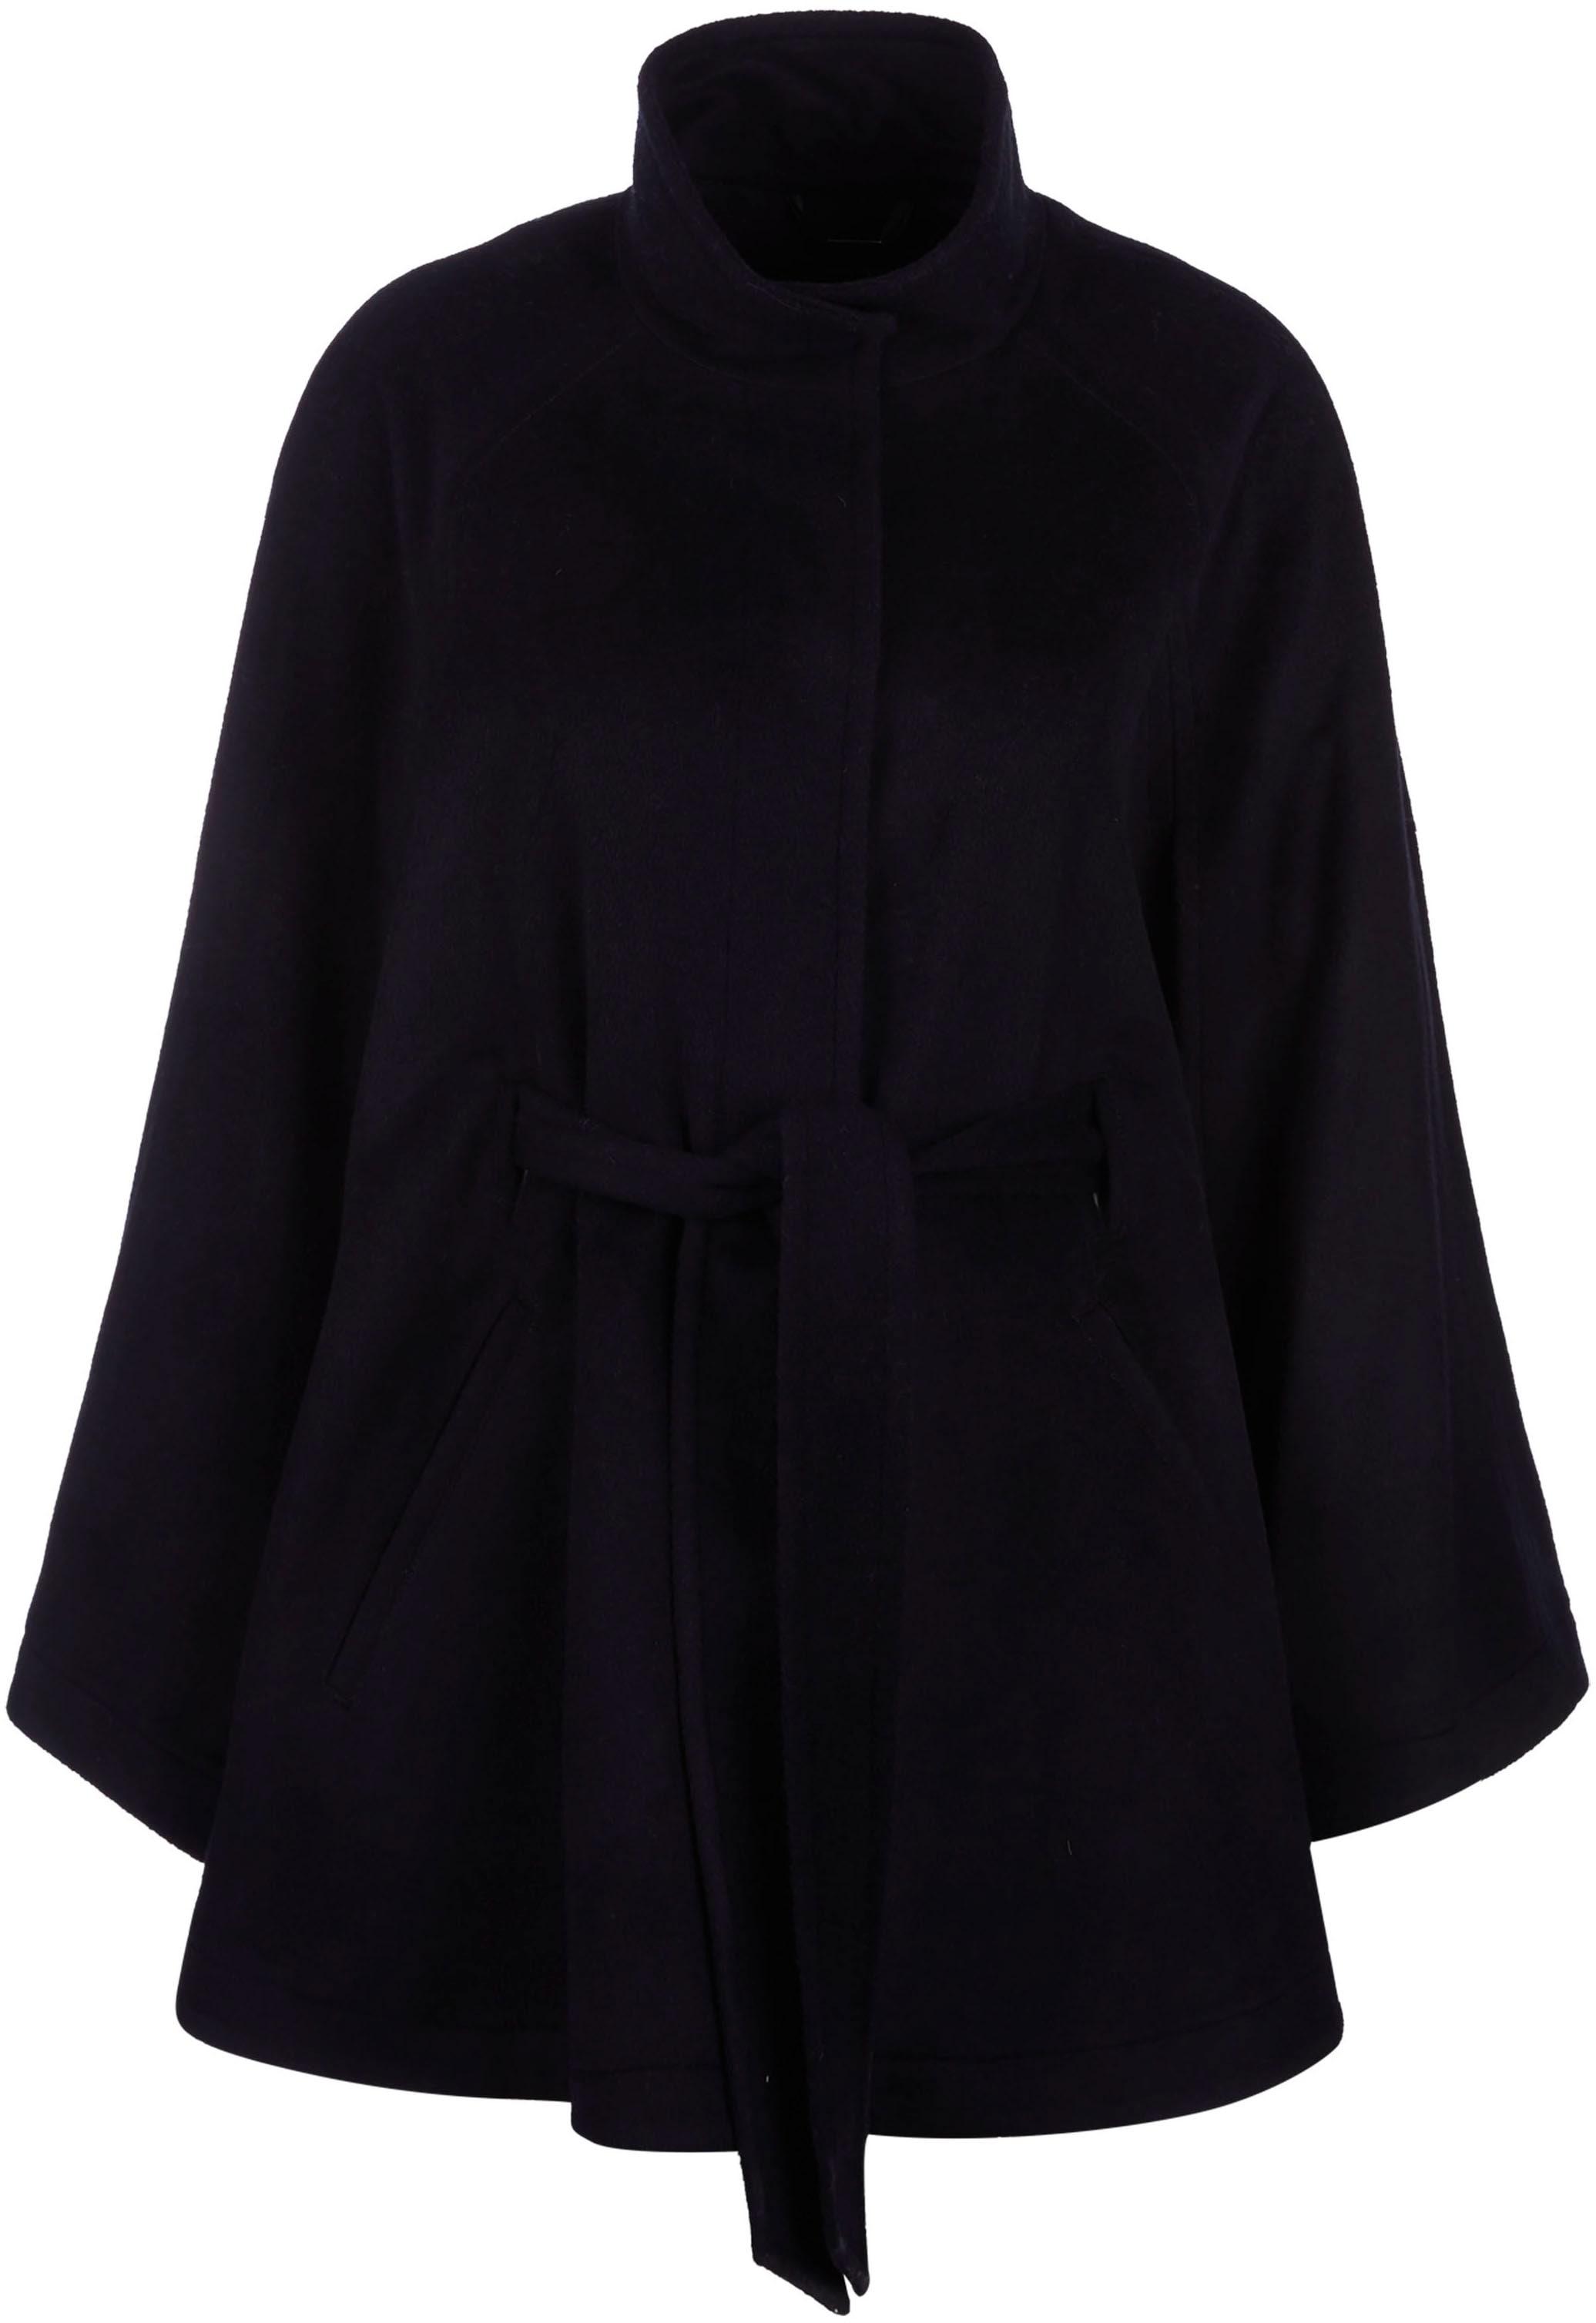 comma -  Kurzmantel, in eleganter Cape-Form, aus softer Woll-Mix-Qualität